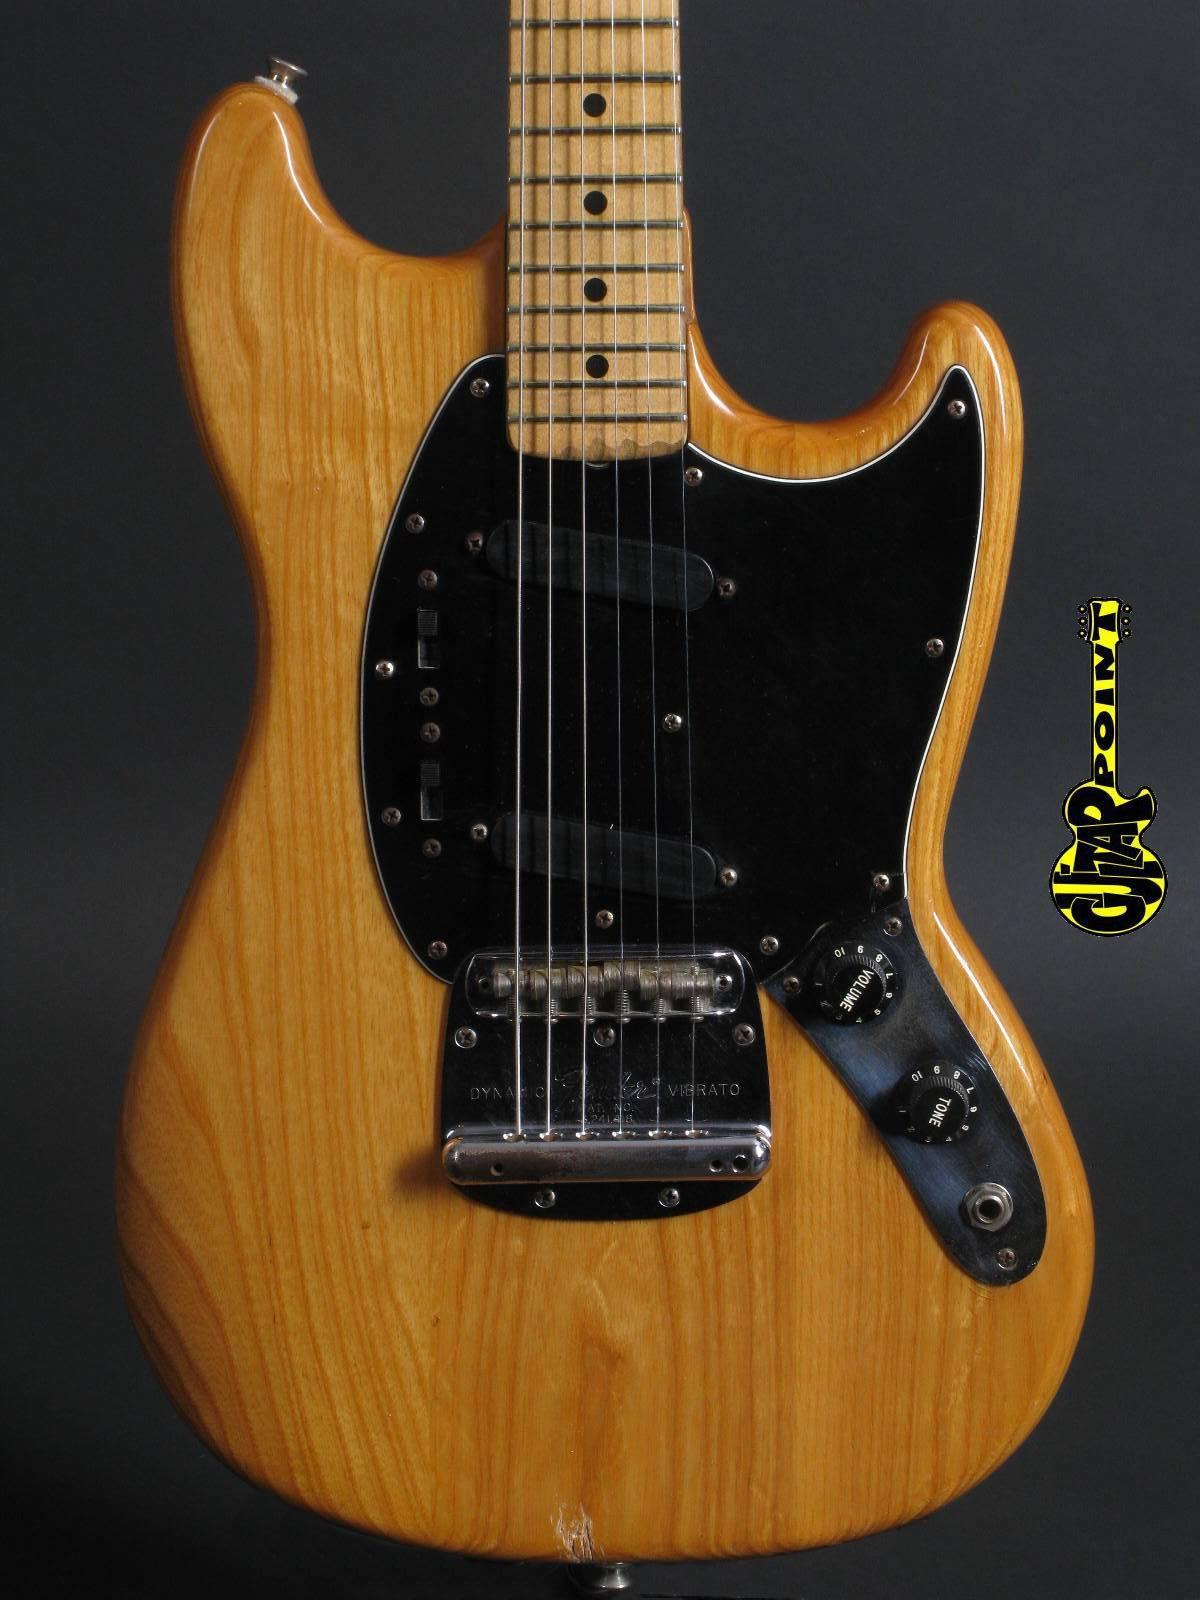 1978 Fender Mustang - Natural